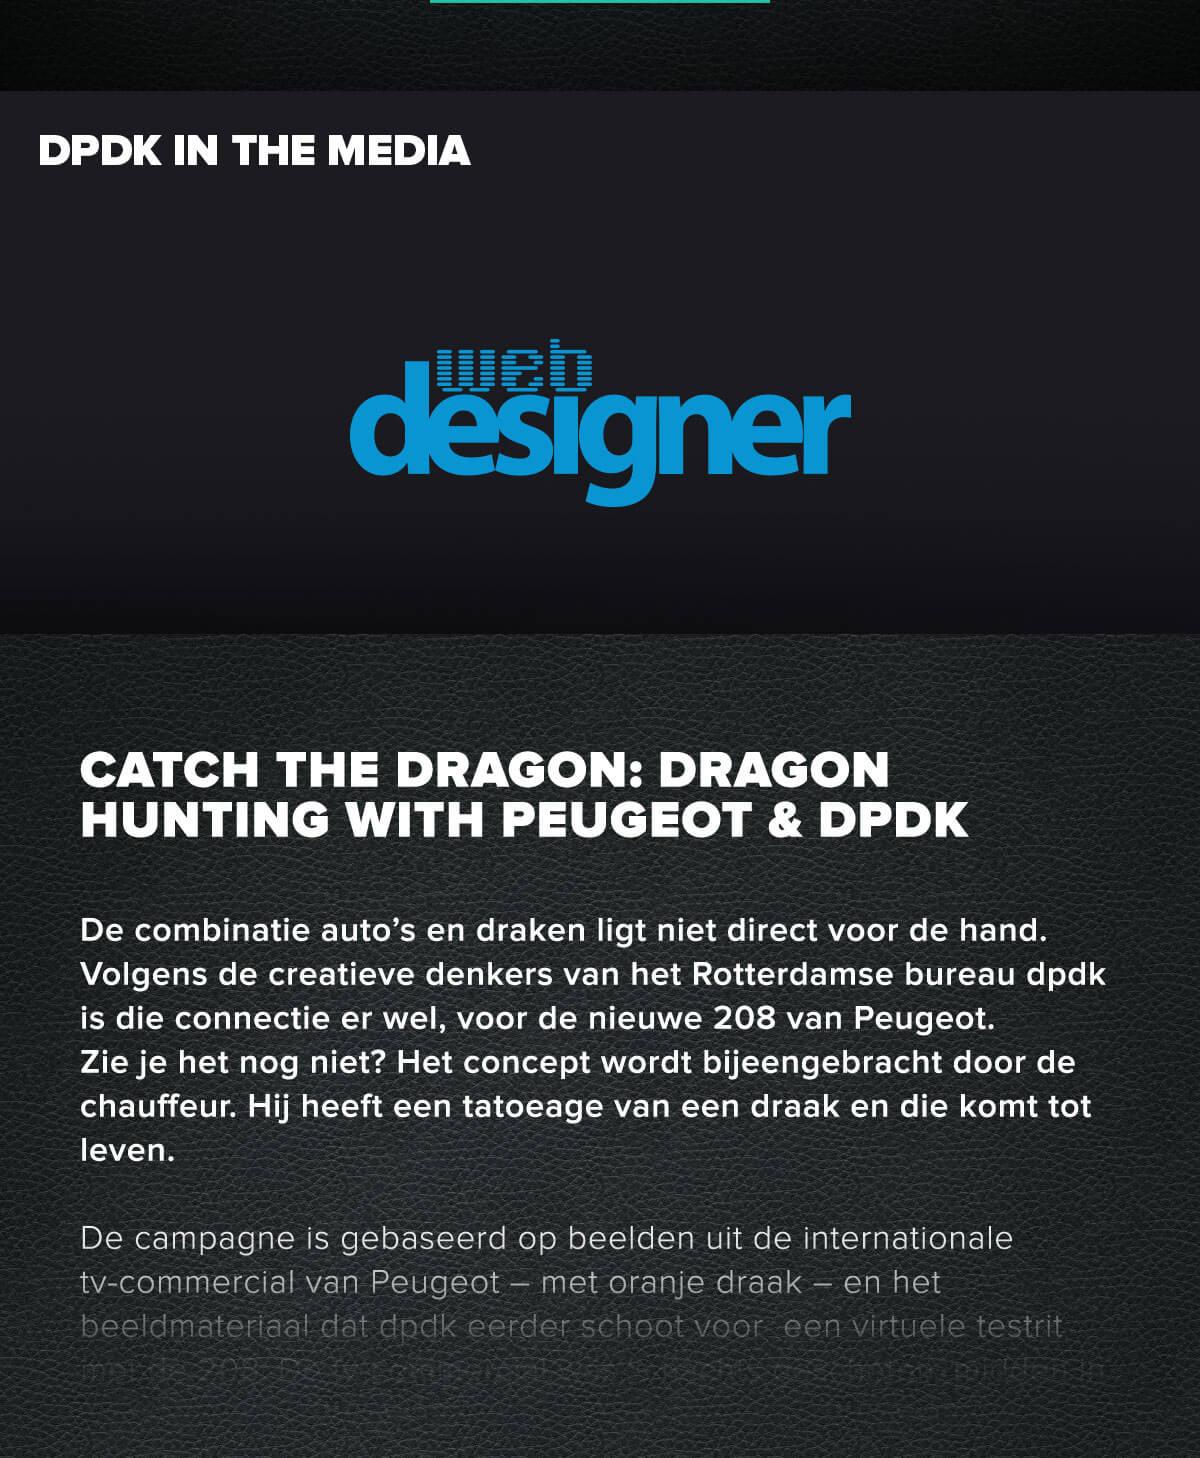 dpdk in the media